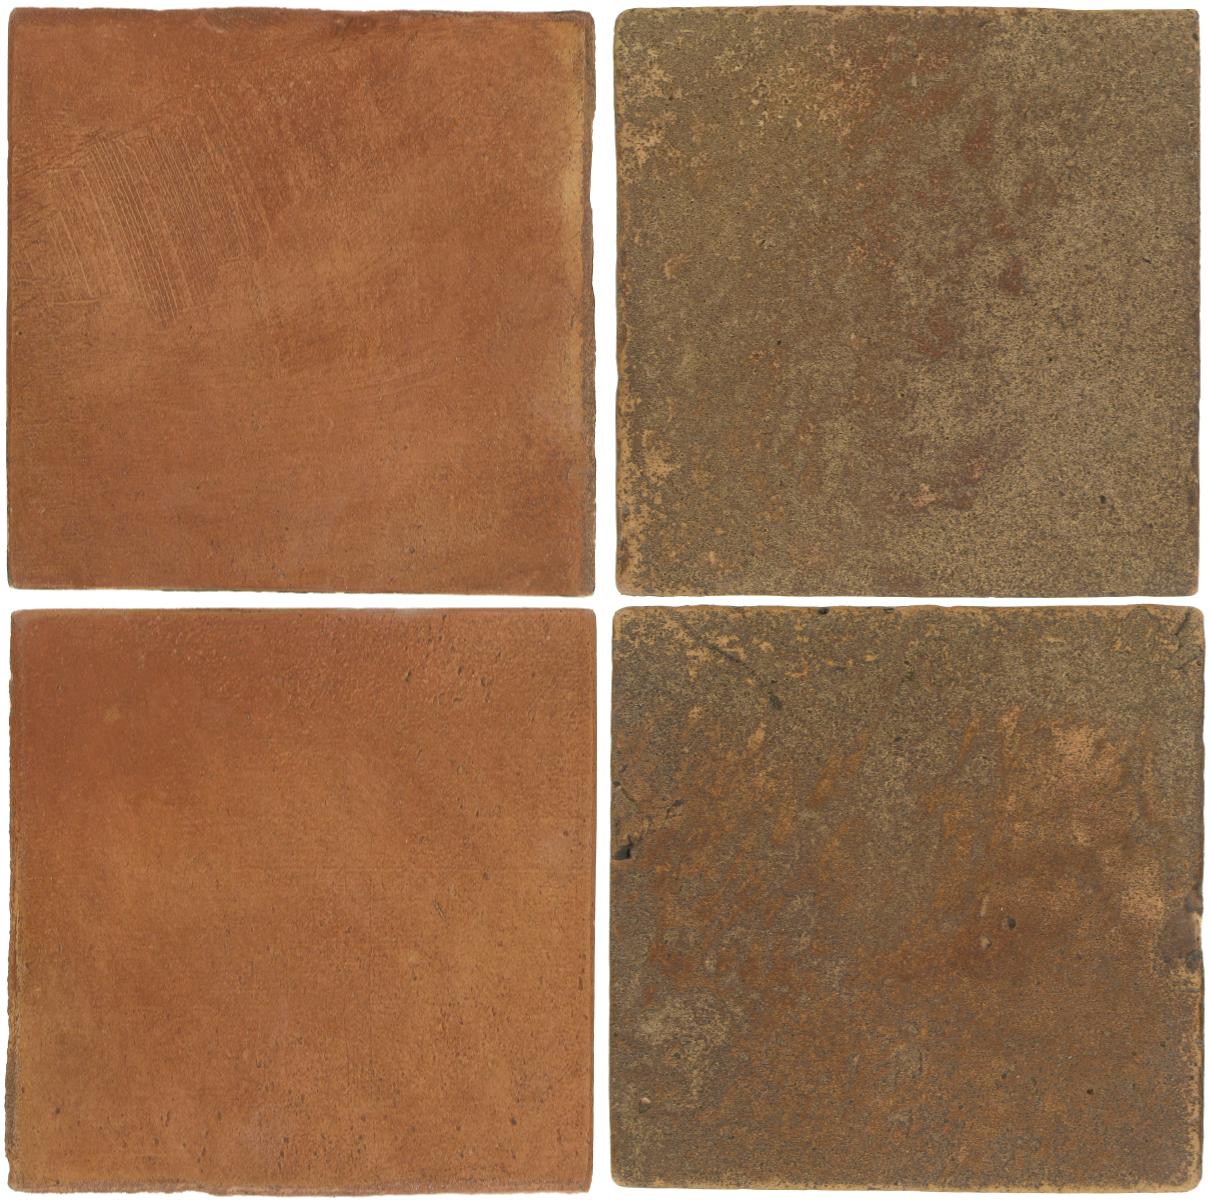 Pedralbes Antique Terracotta  2 Color Combinations  OHS-PSTR Traditional + VTG-PSCM Camel Brown